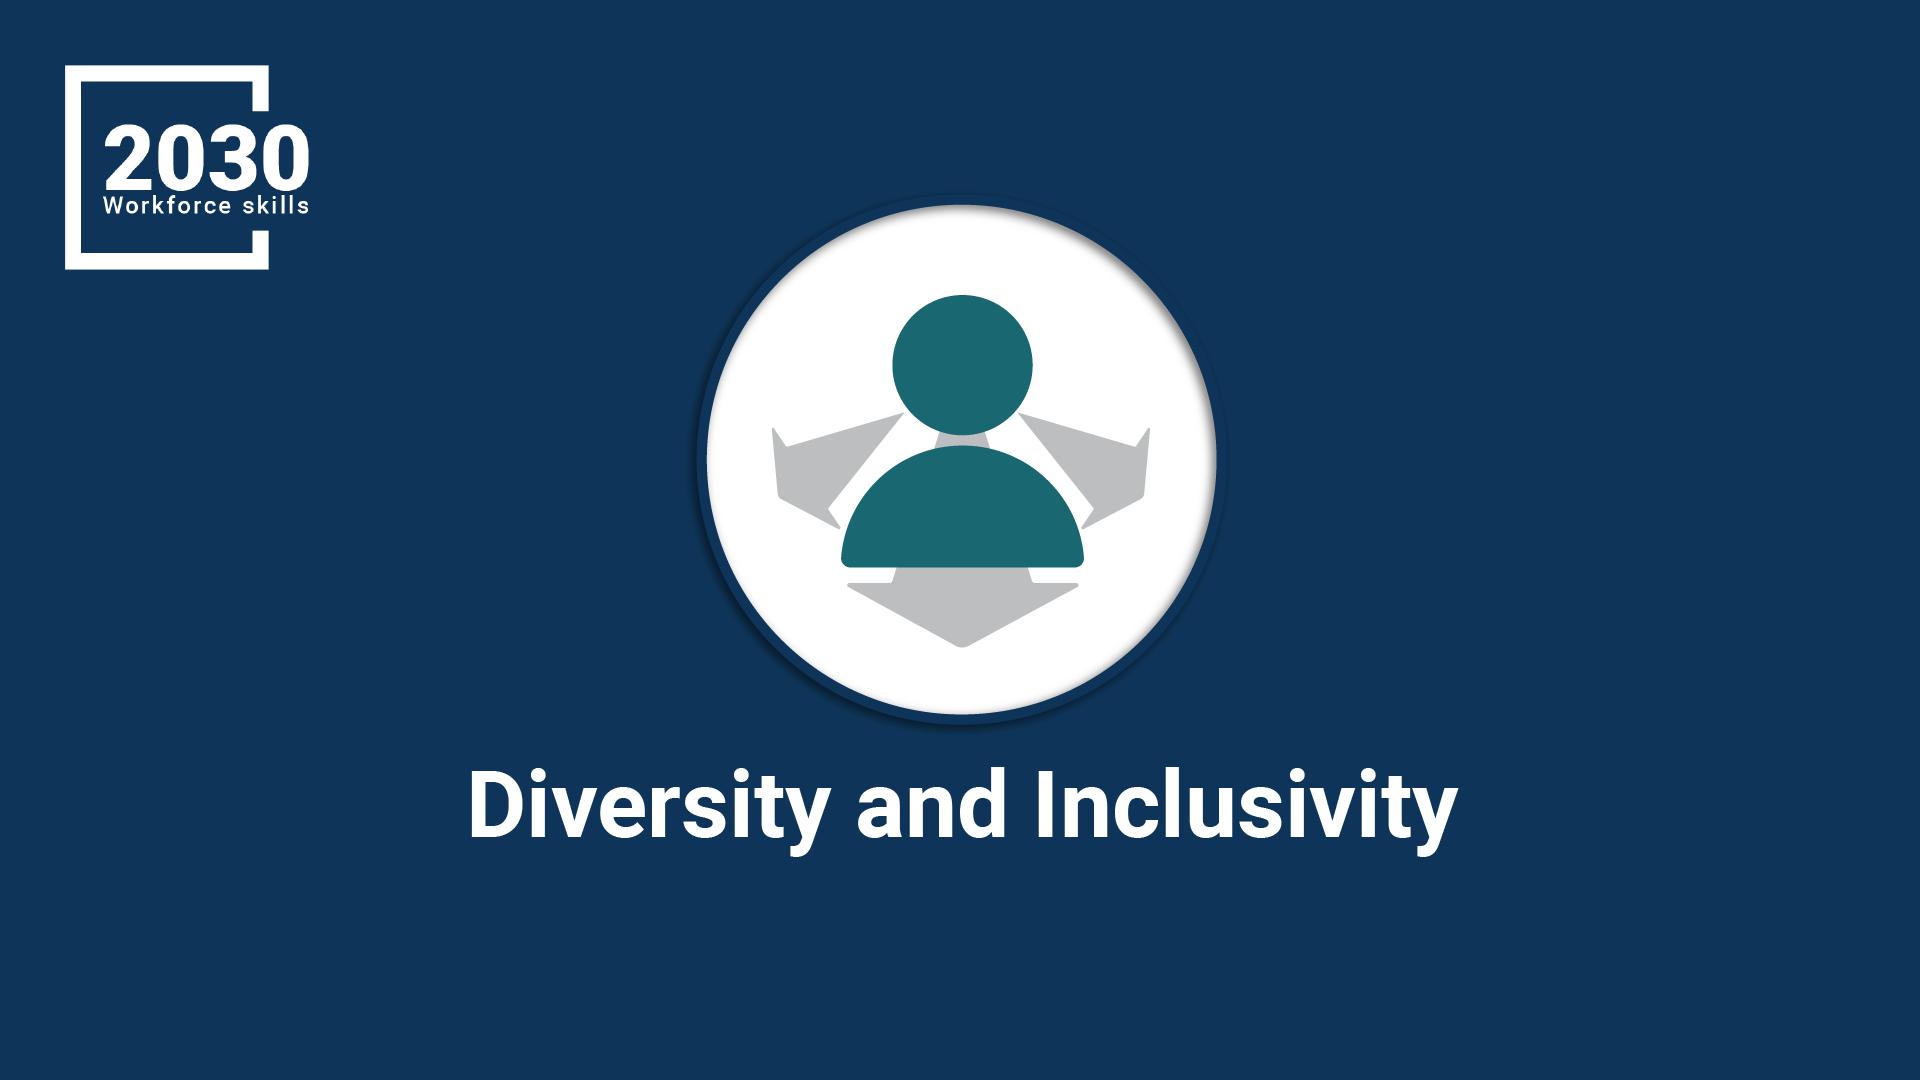 Diversity and Inclusivity